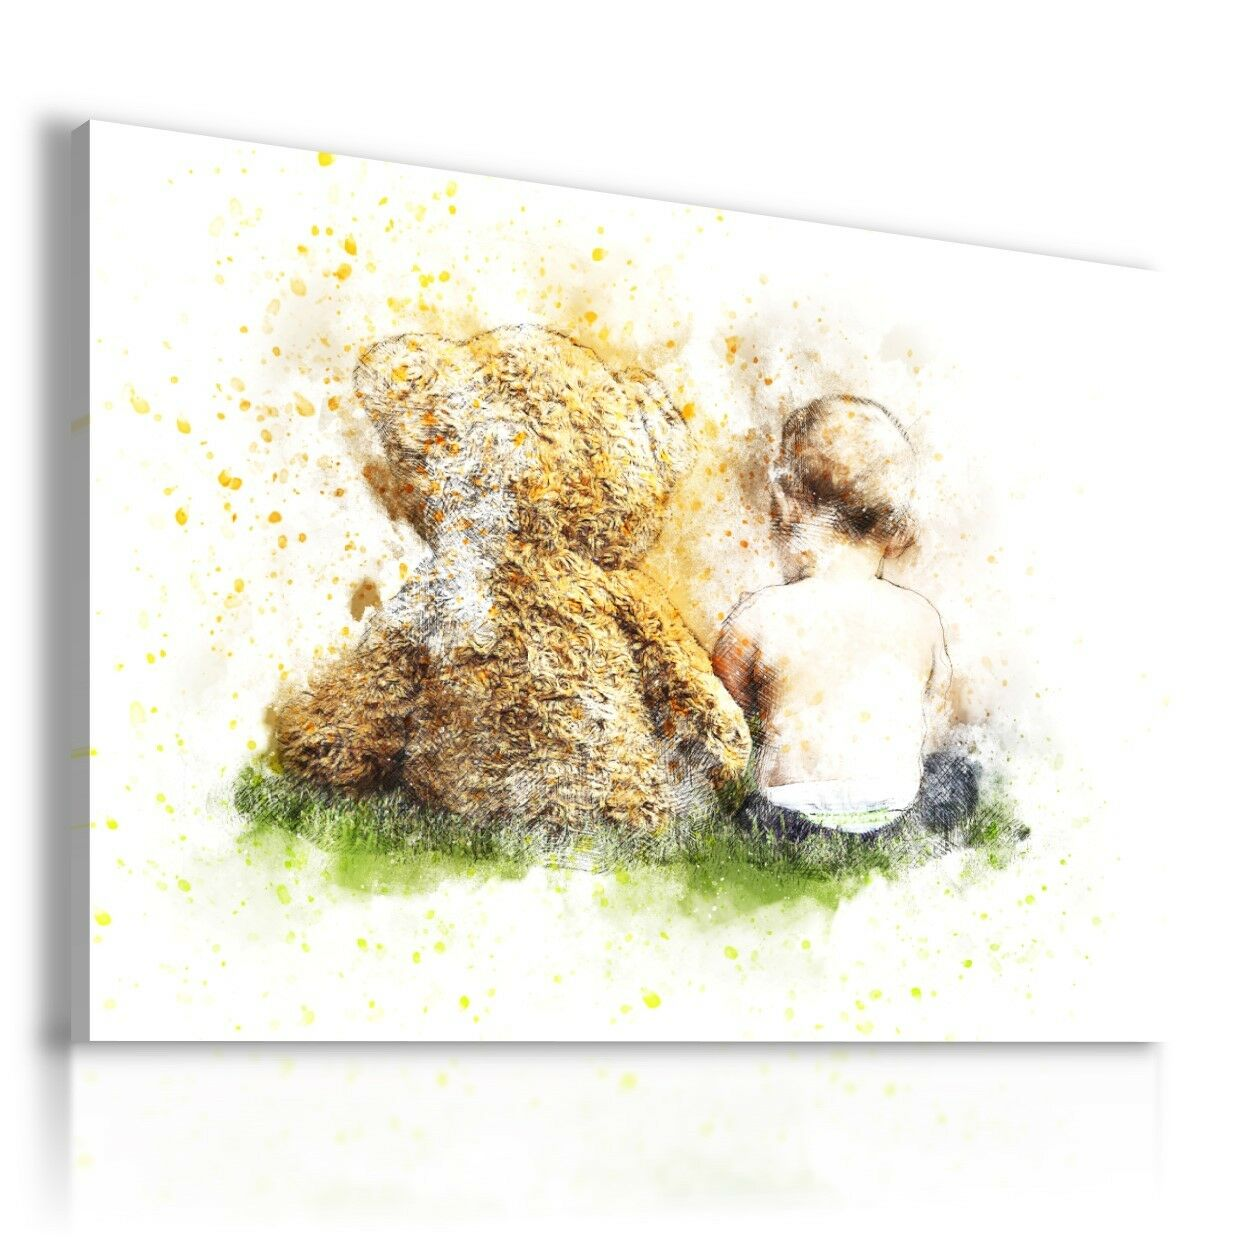 PAINTING DRAWING KIDS TEDDY BEAR BOY PRINT Canvas Wall Art R178 MATAGA